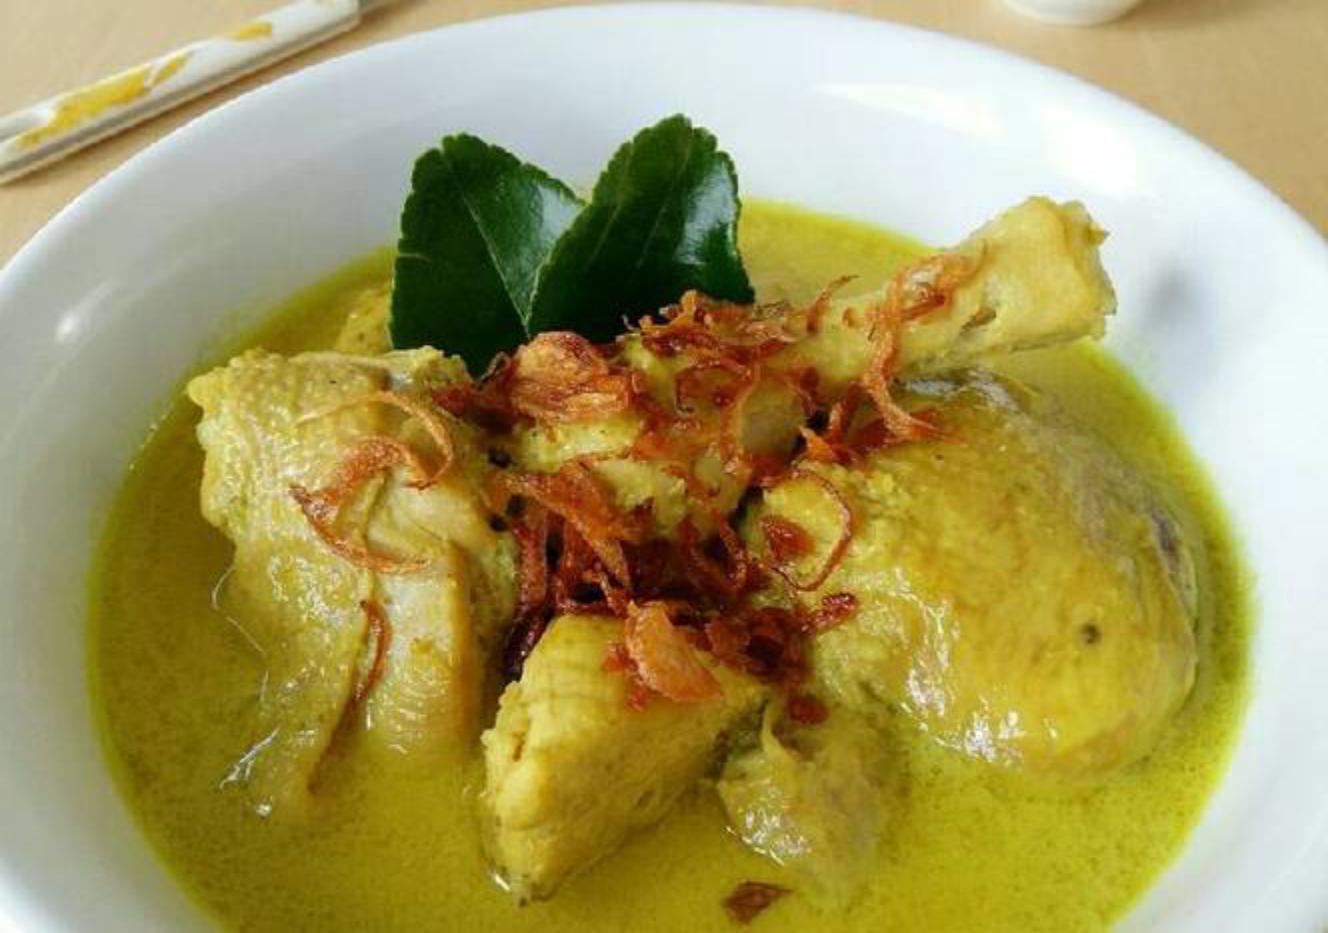 Resep Masak Opor Ayam Kuning yang Enak - Spesial Resep